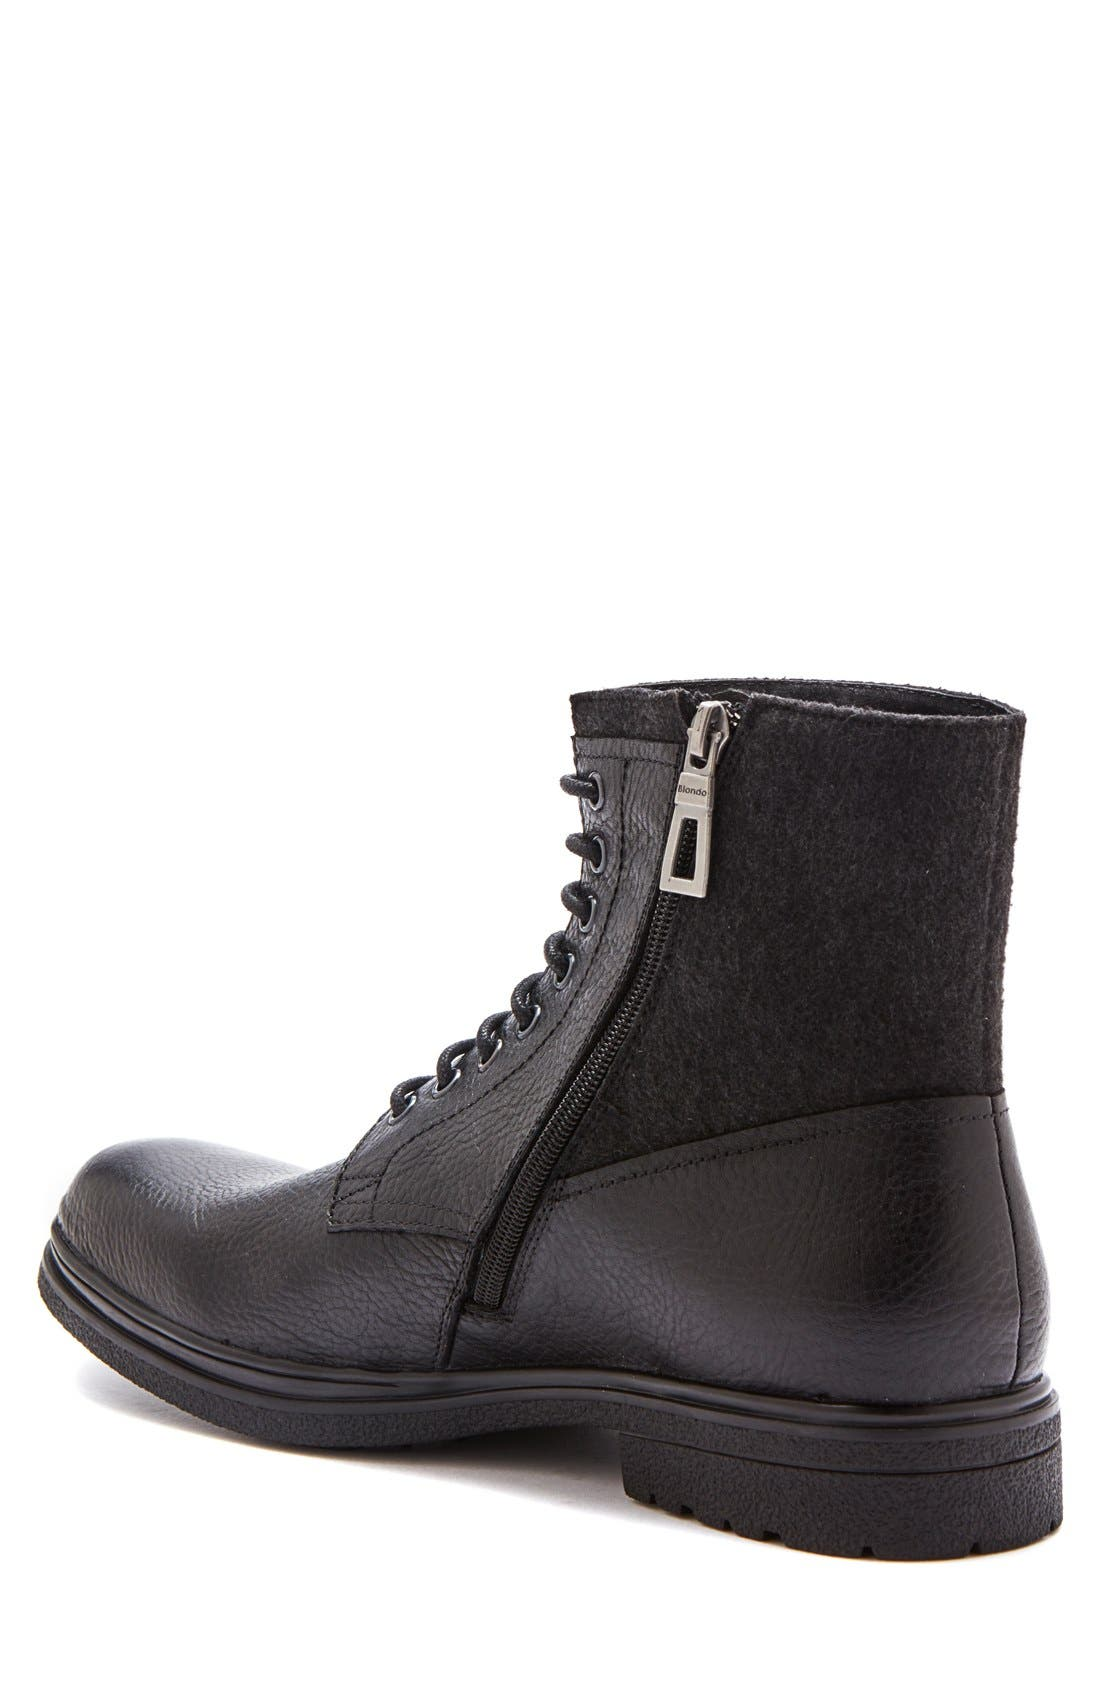 'Backoff' Waterproof Plain Toe Boot,                             Alternate thumbnail 2, color,                             Black Leather